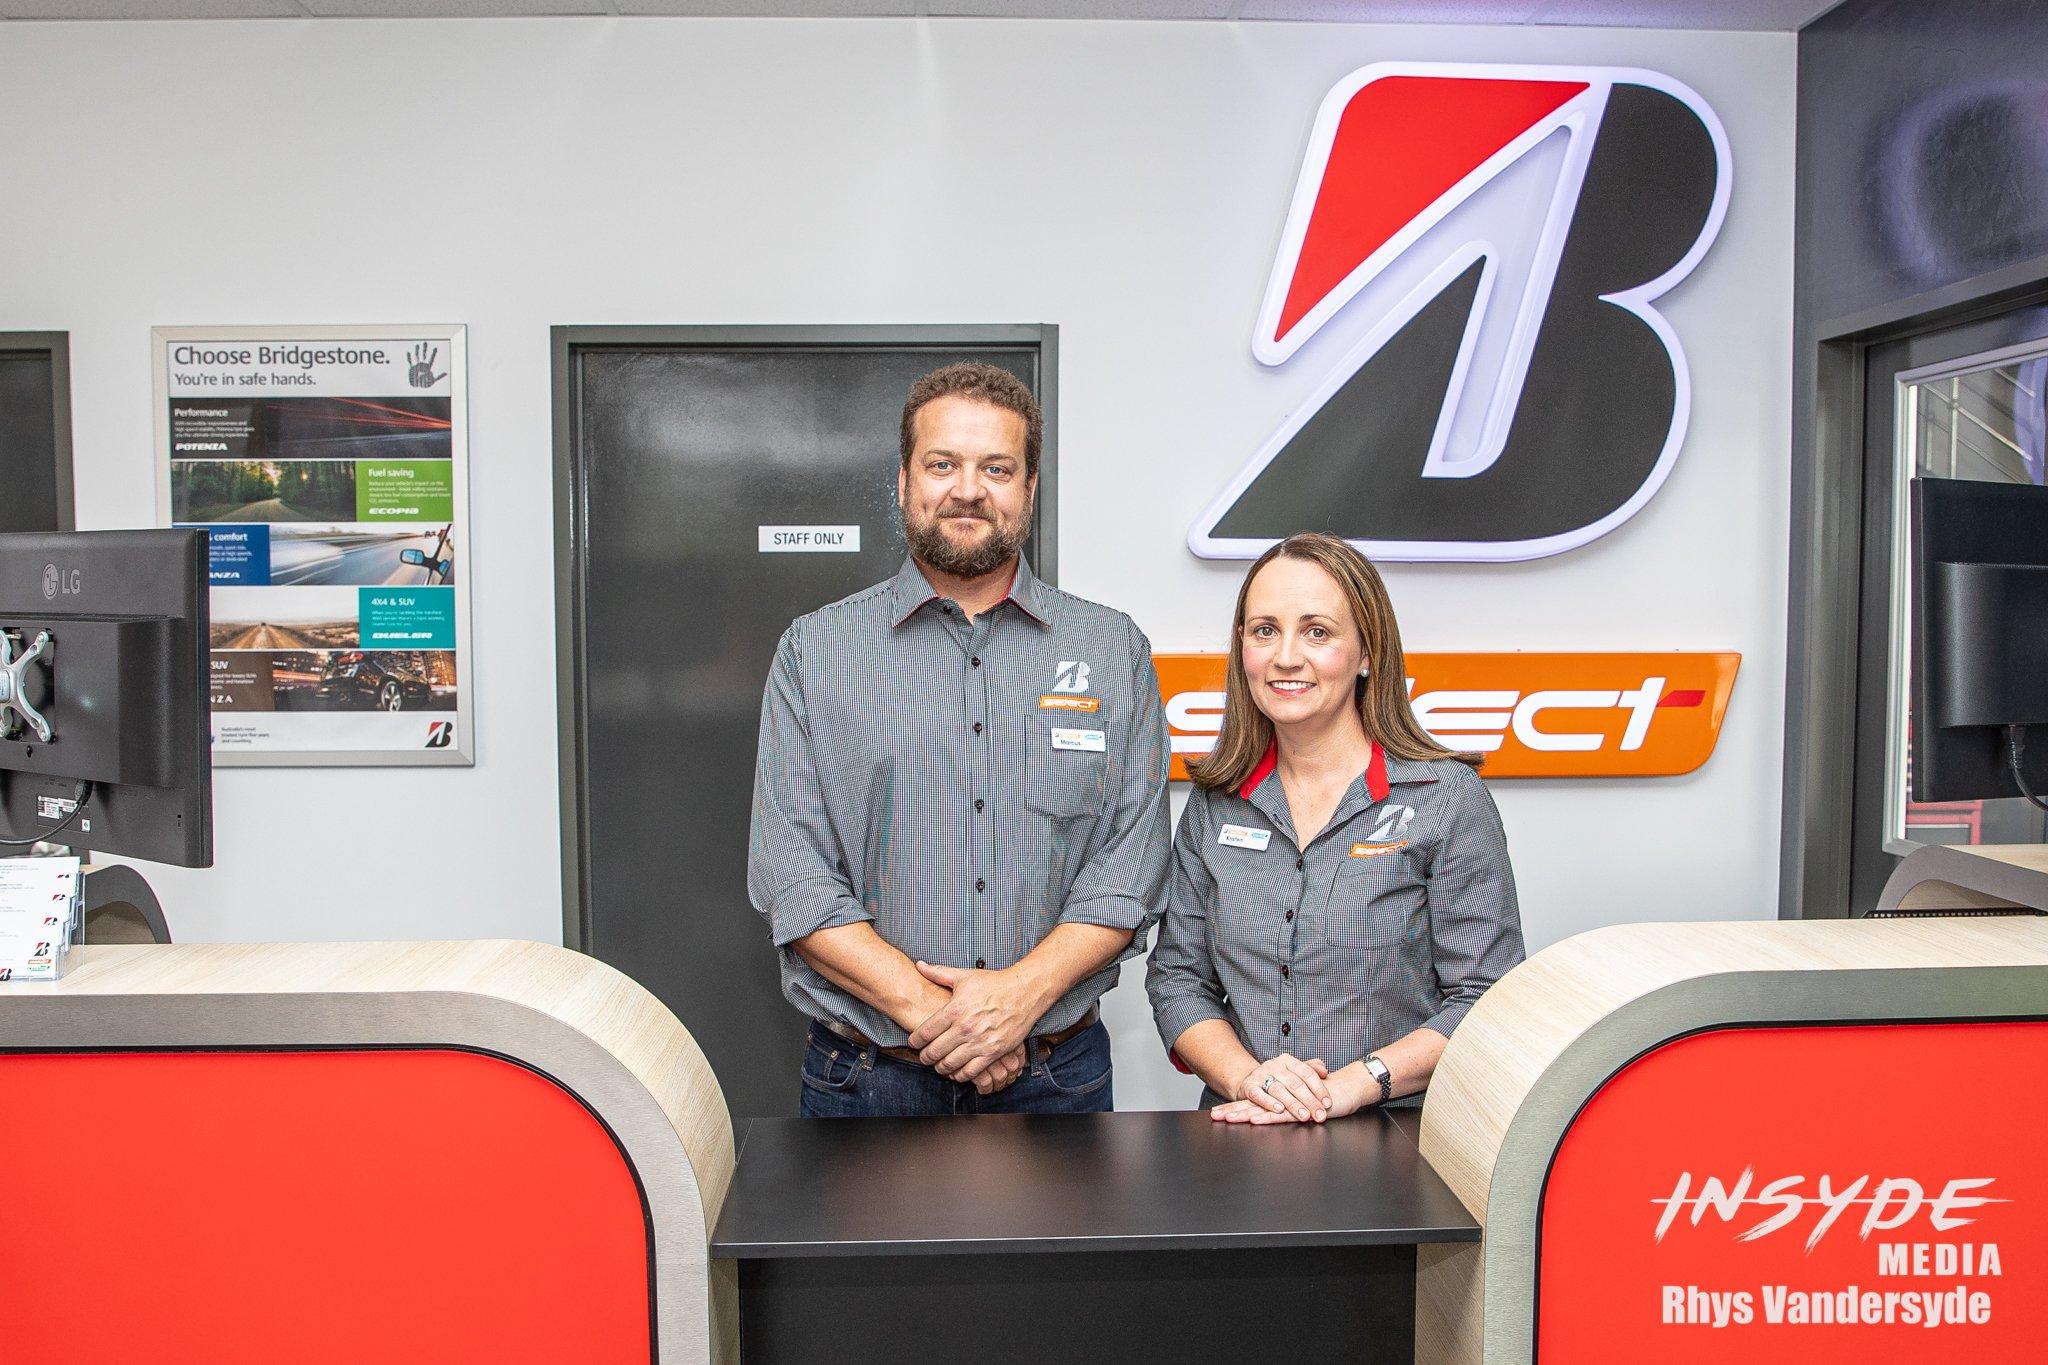 Bridgestone - B-Select Stores